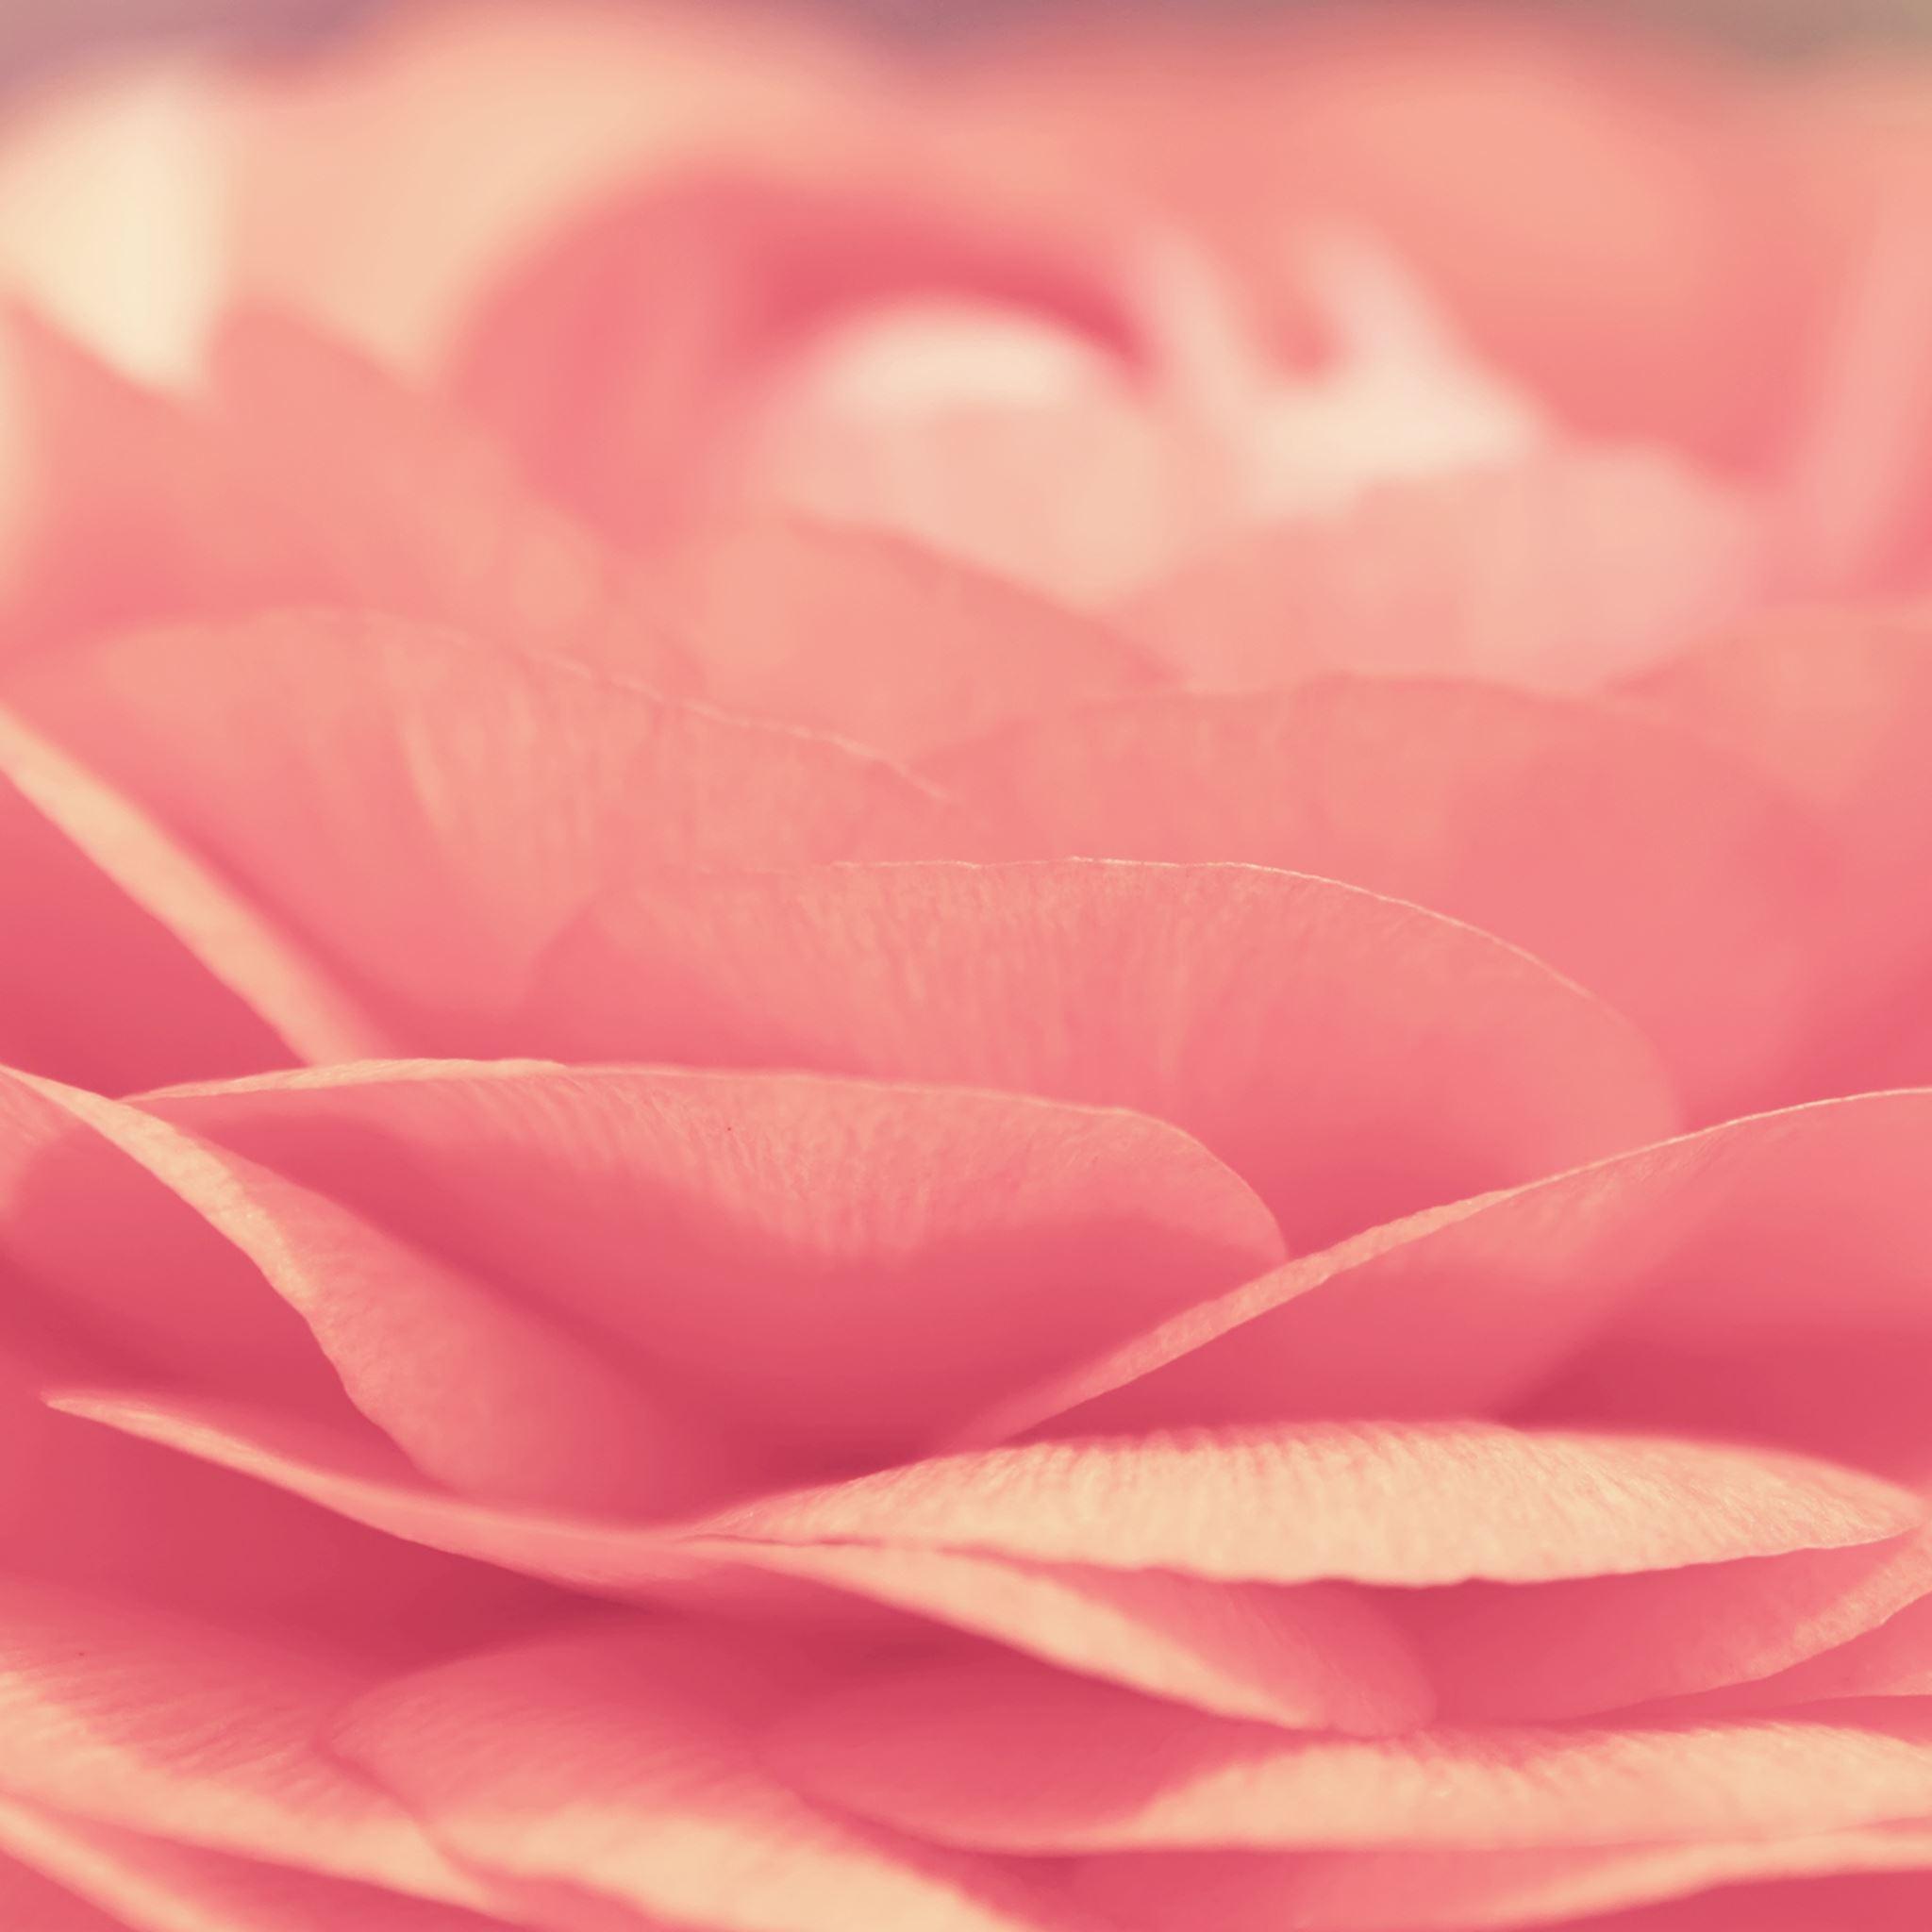 pink flower closeup ipad air wallpaper download | iphone wallpapers